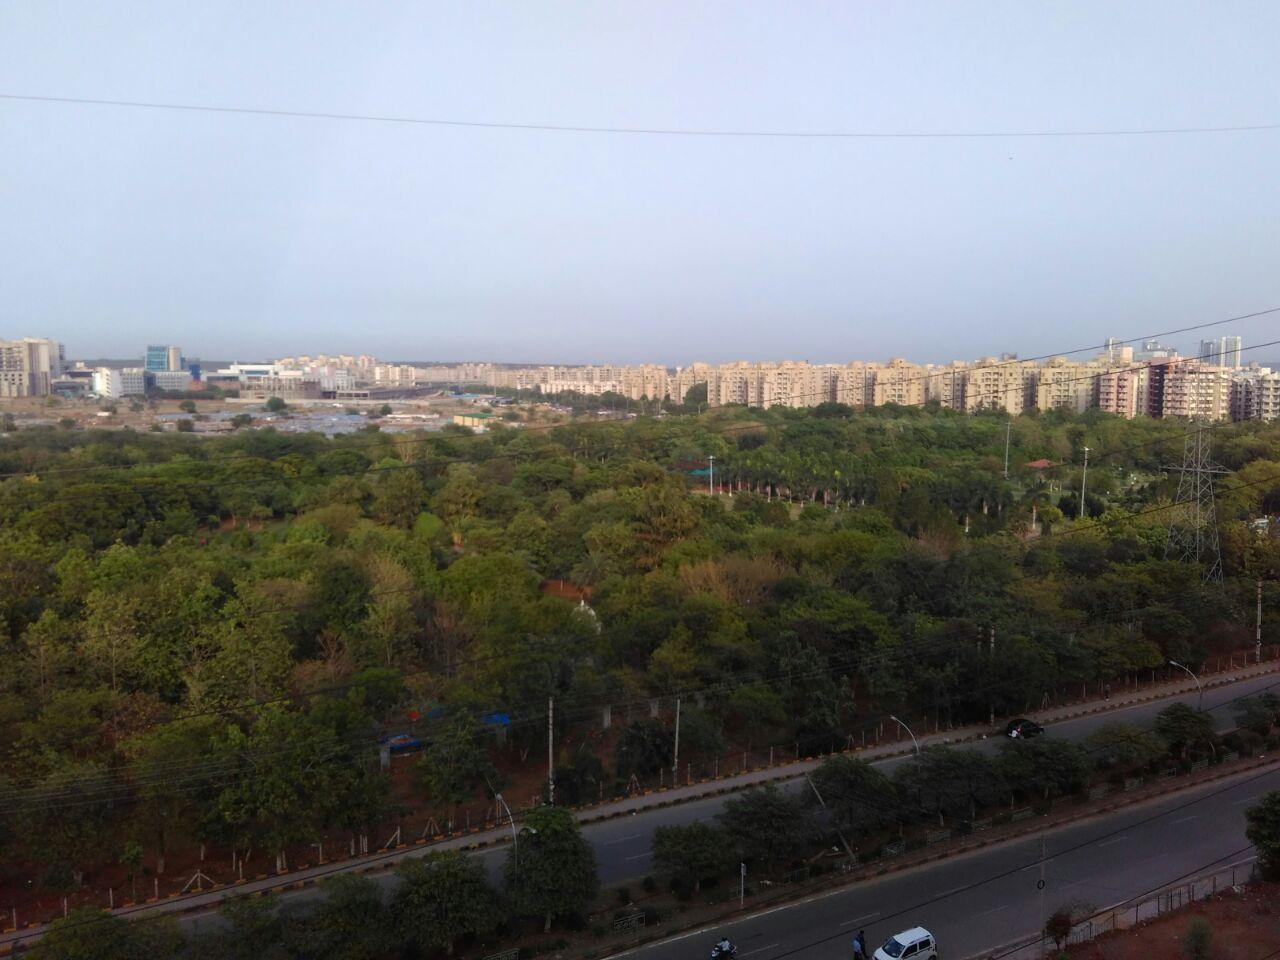 Skyline of Golf Course Road Gurgaon